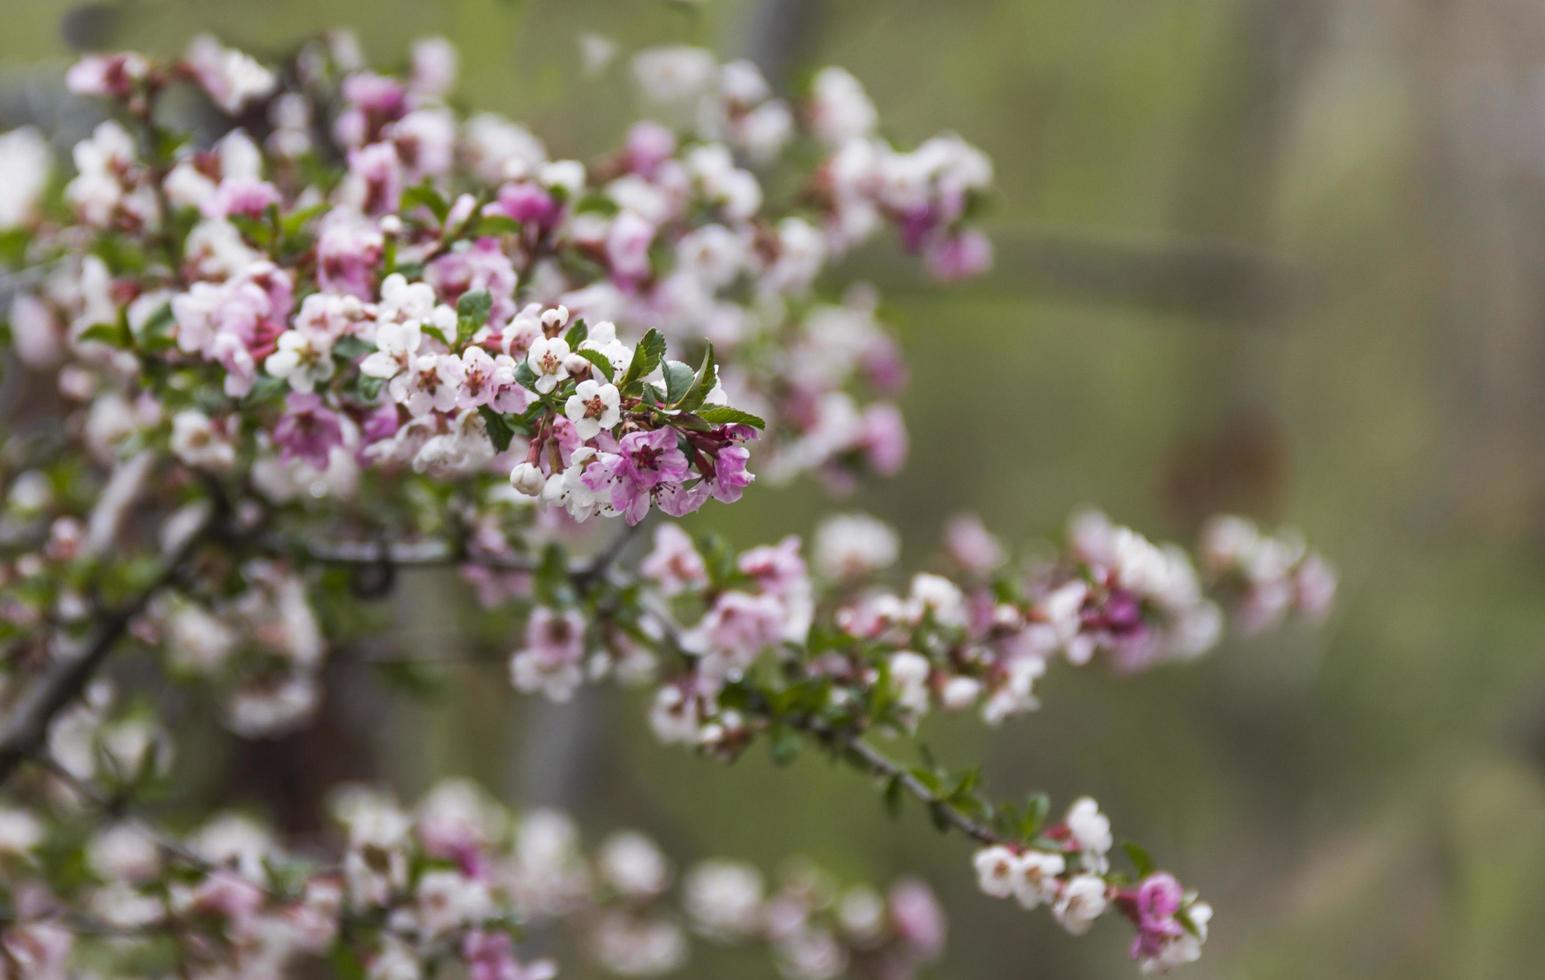 Blossom in spring season photo